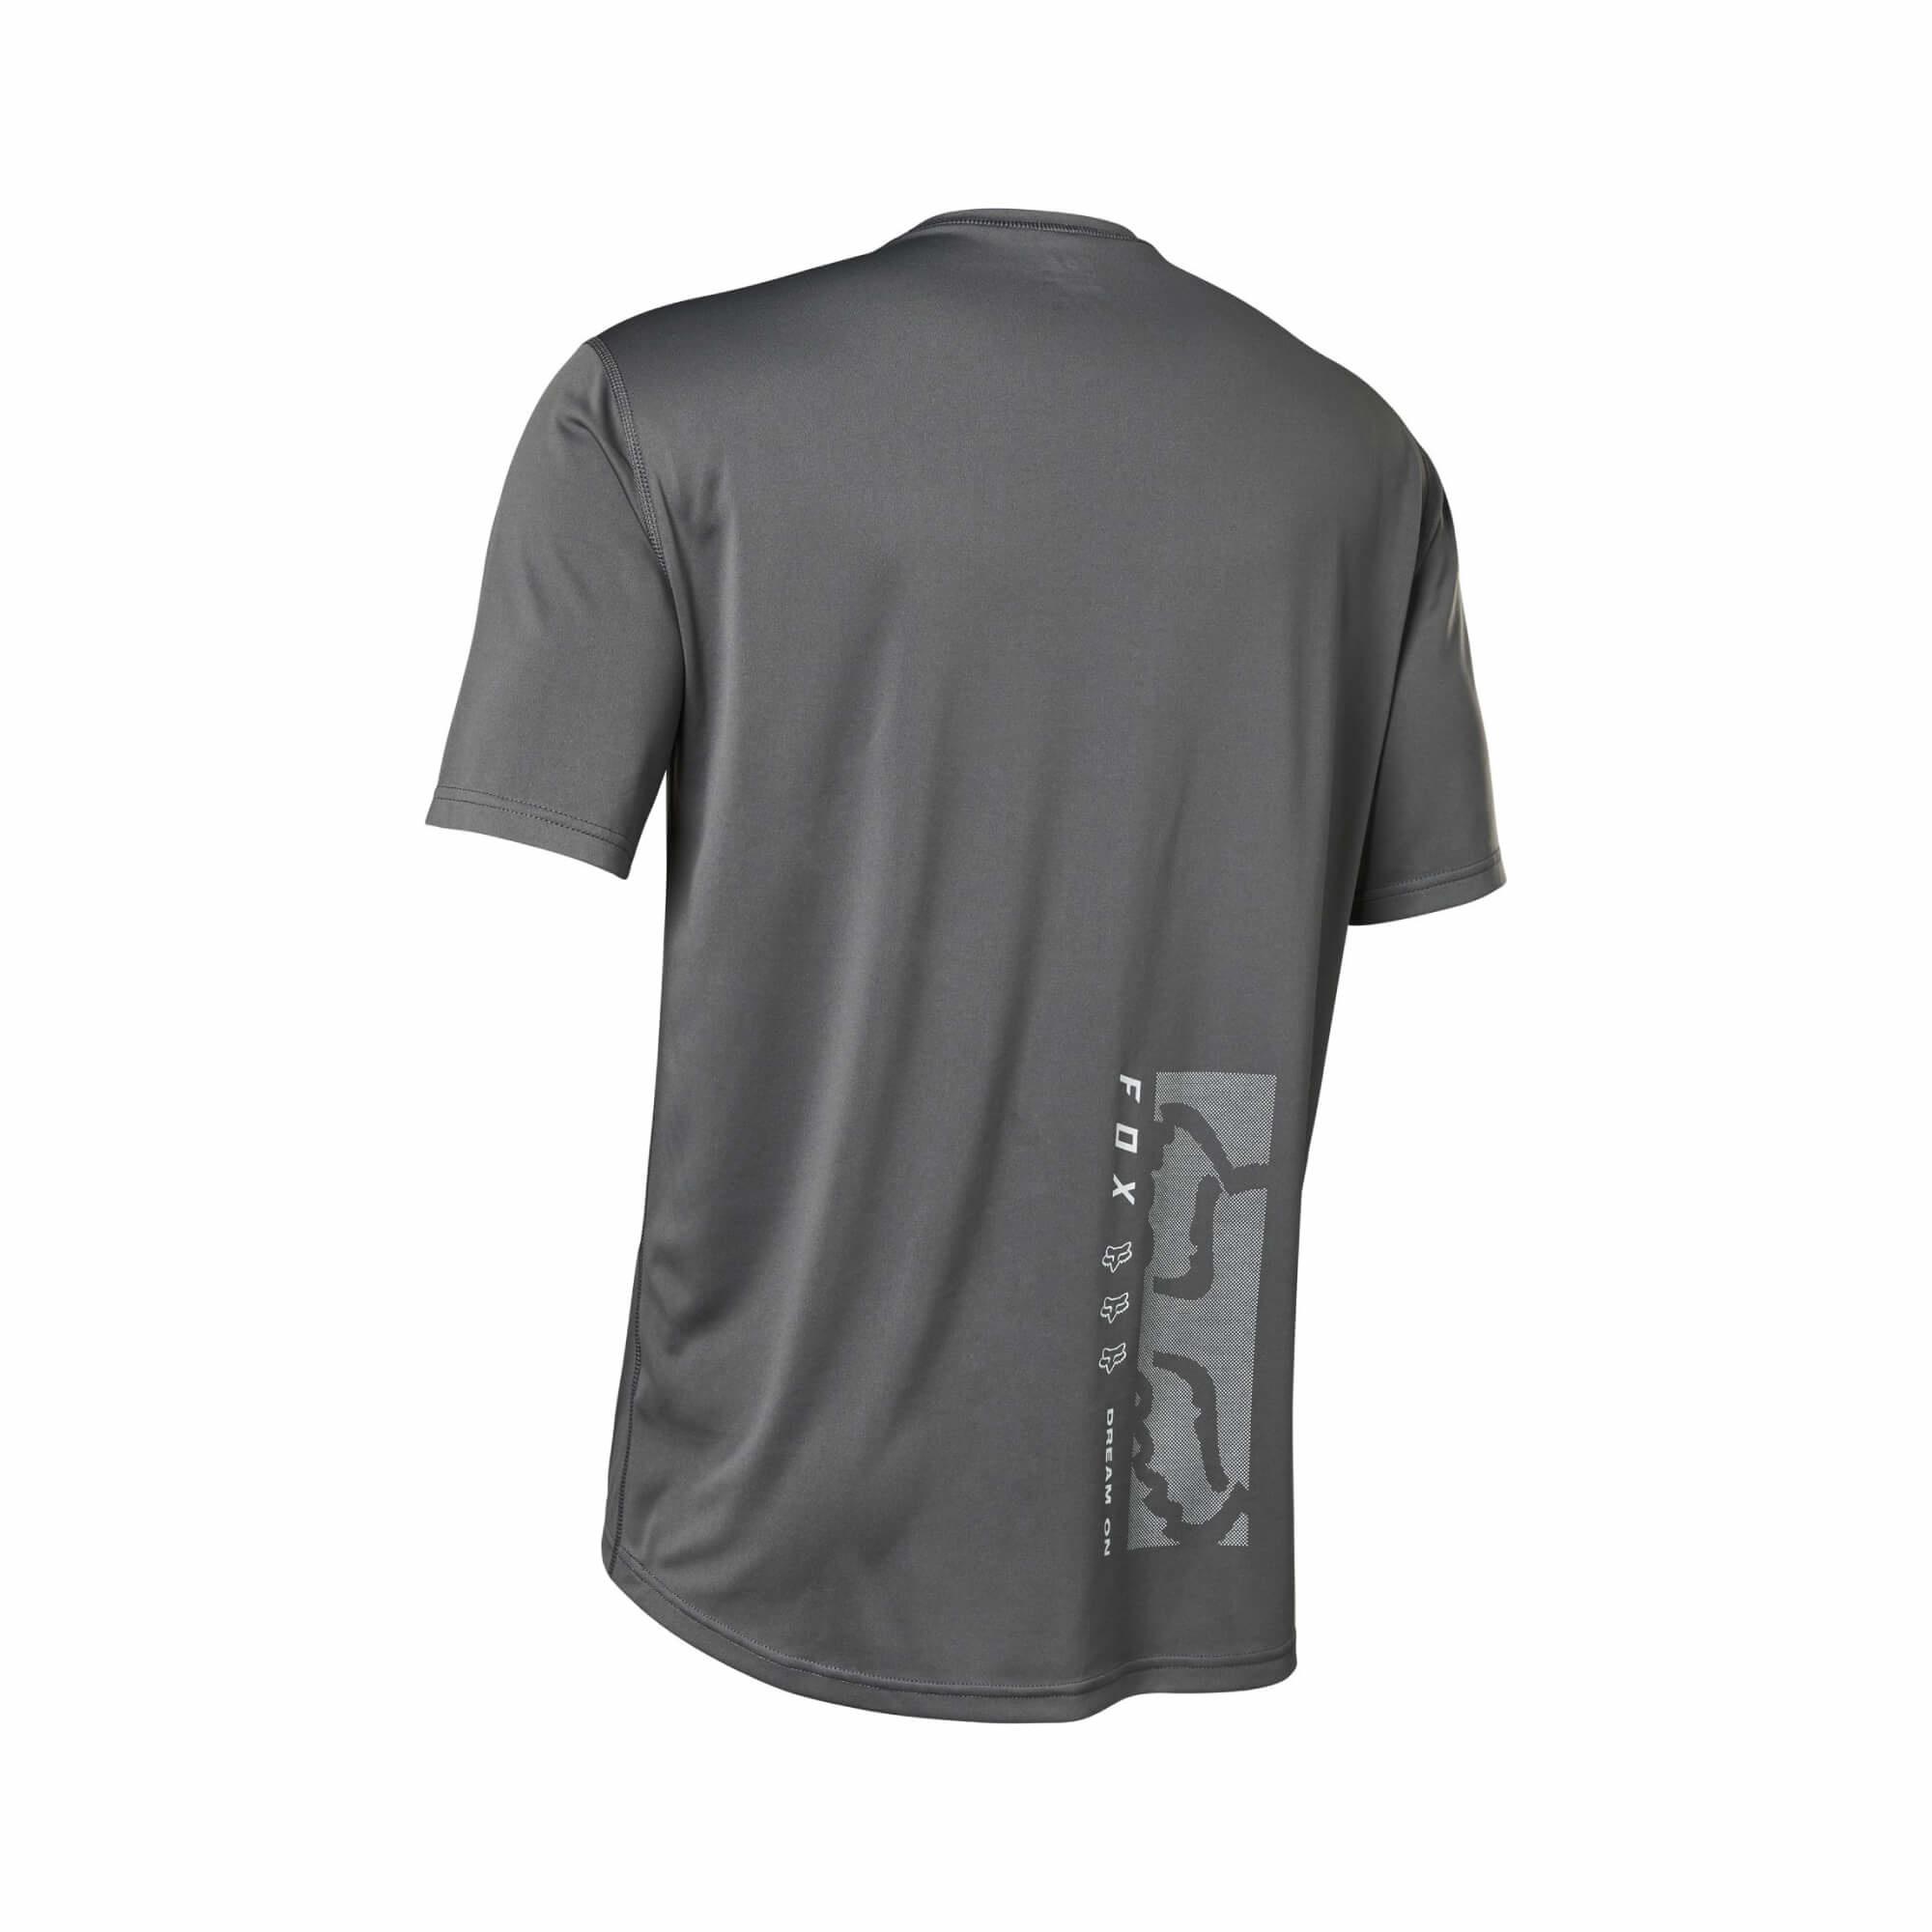 Ranger Short Sleeve Jersey Graphic 2 2021-4